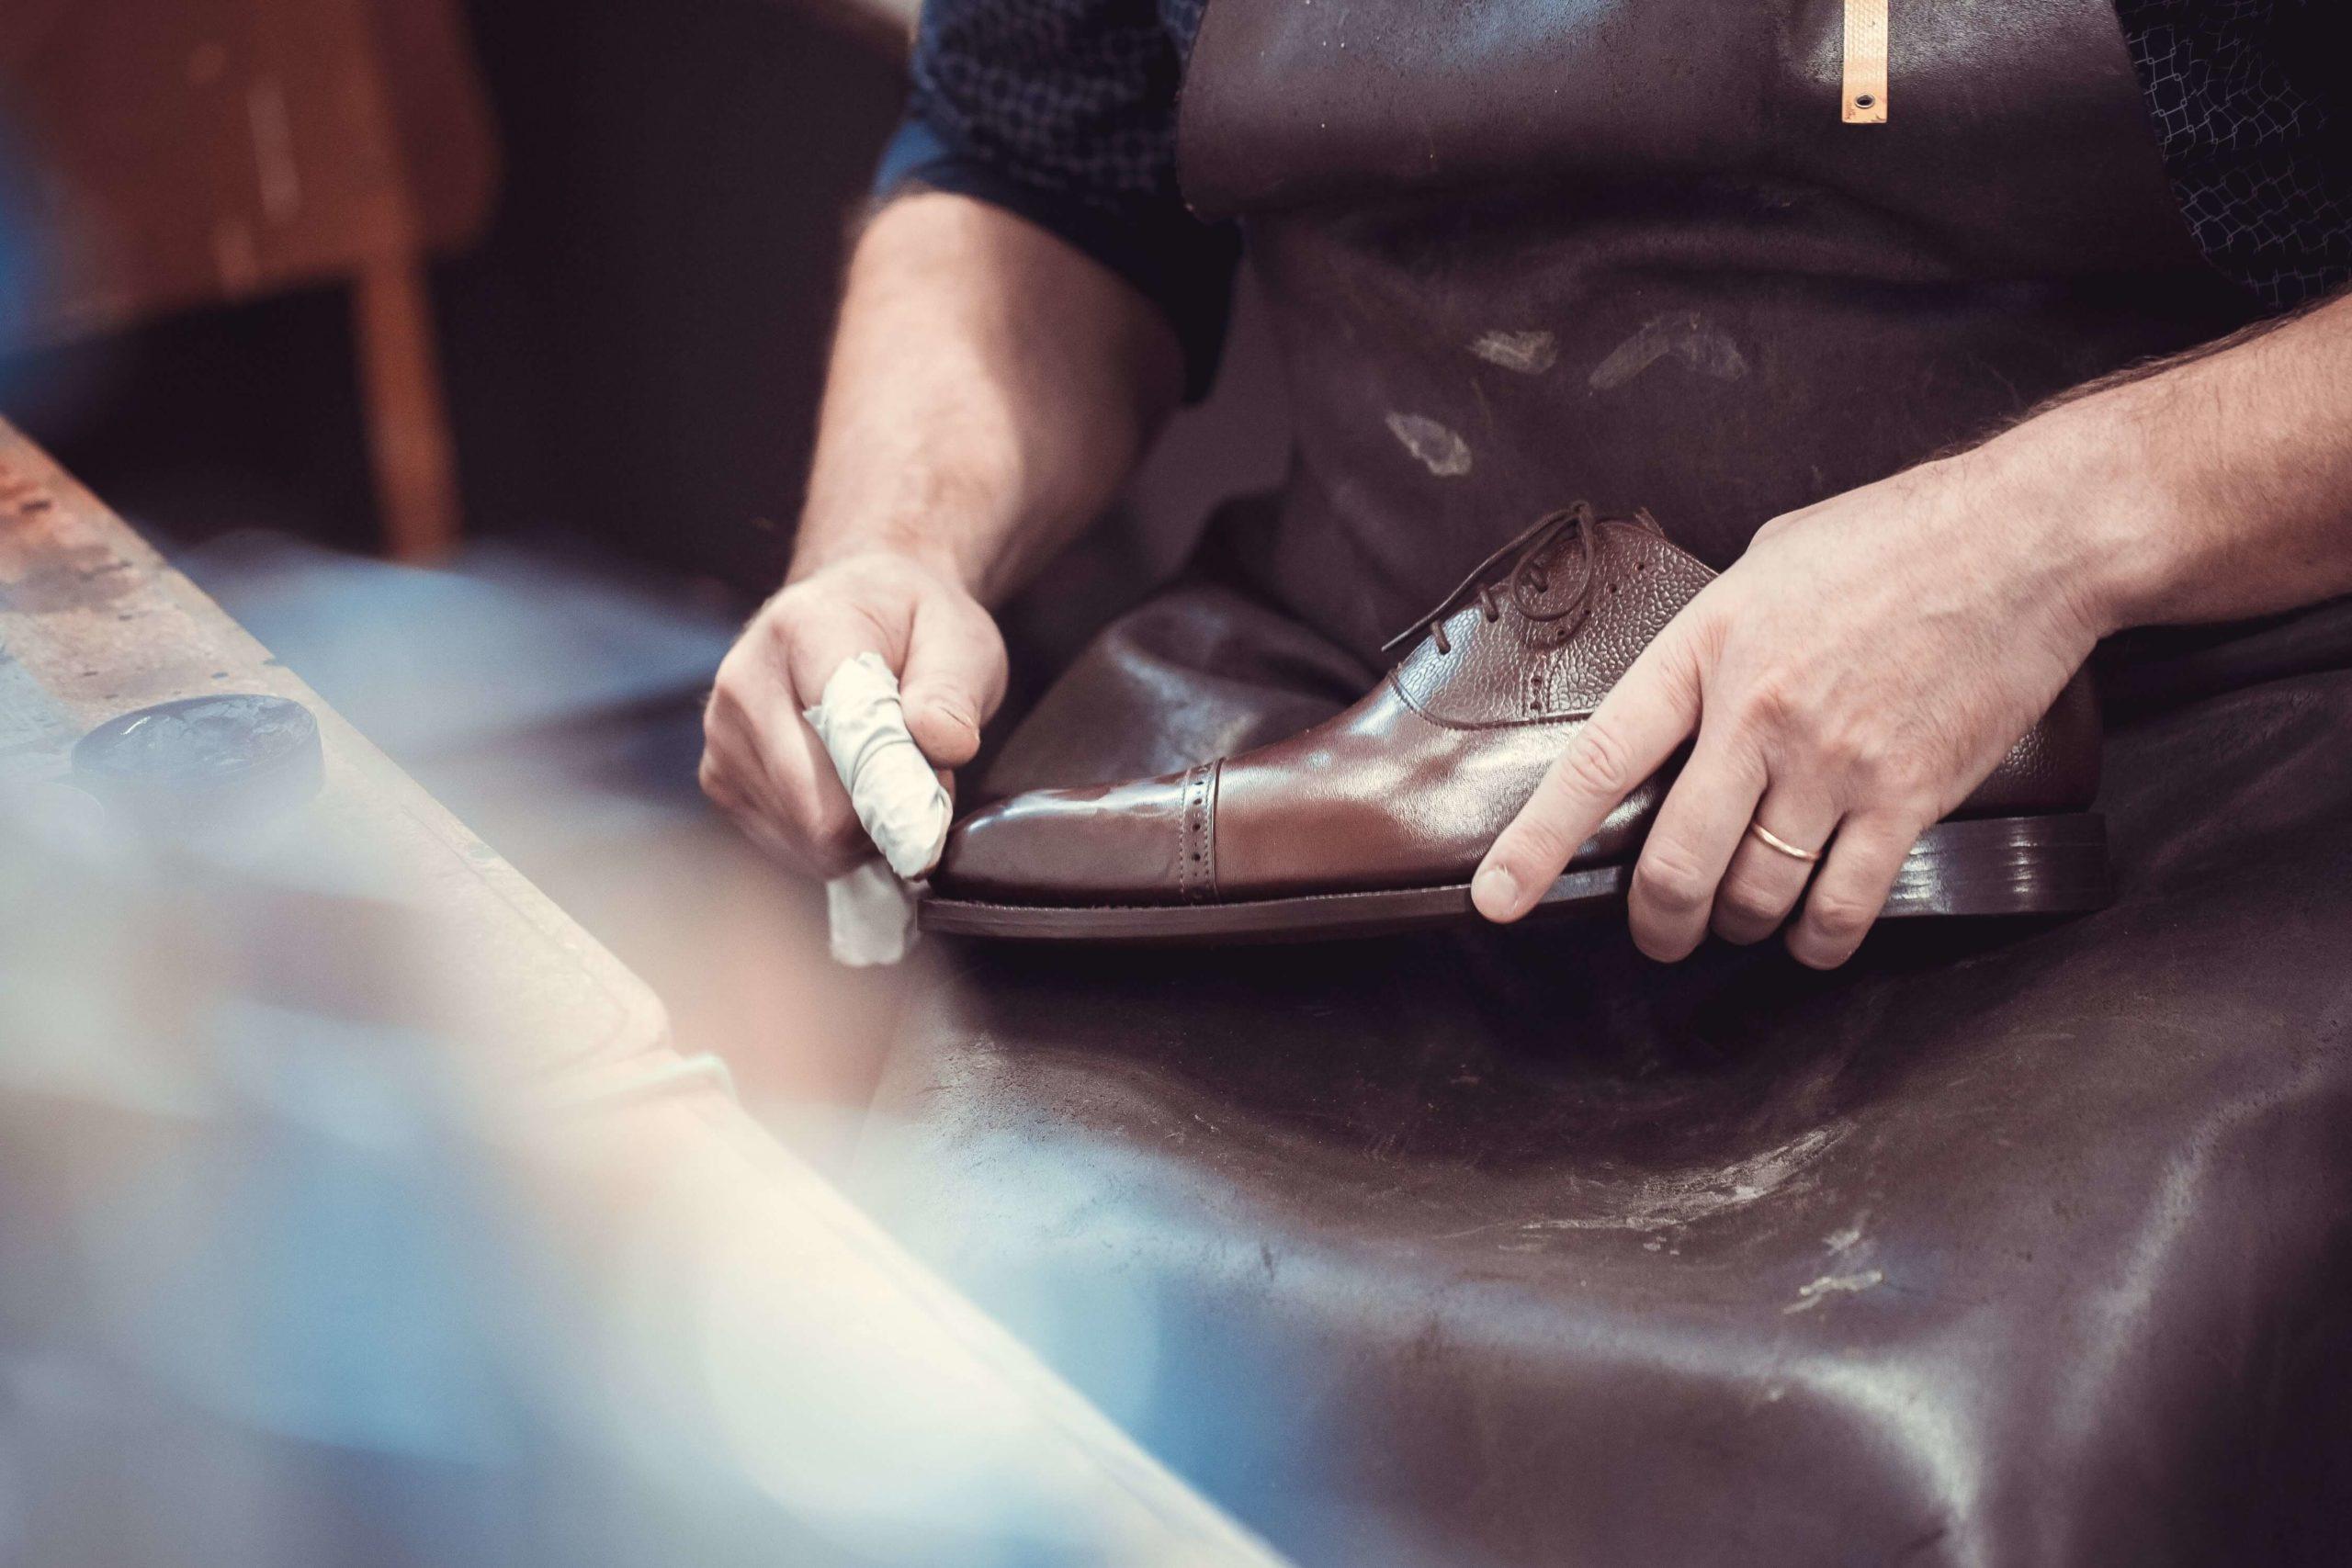 Paul Dascotte shoemaker and cobbler